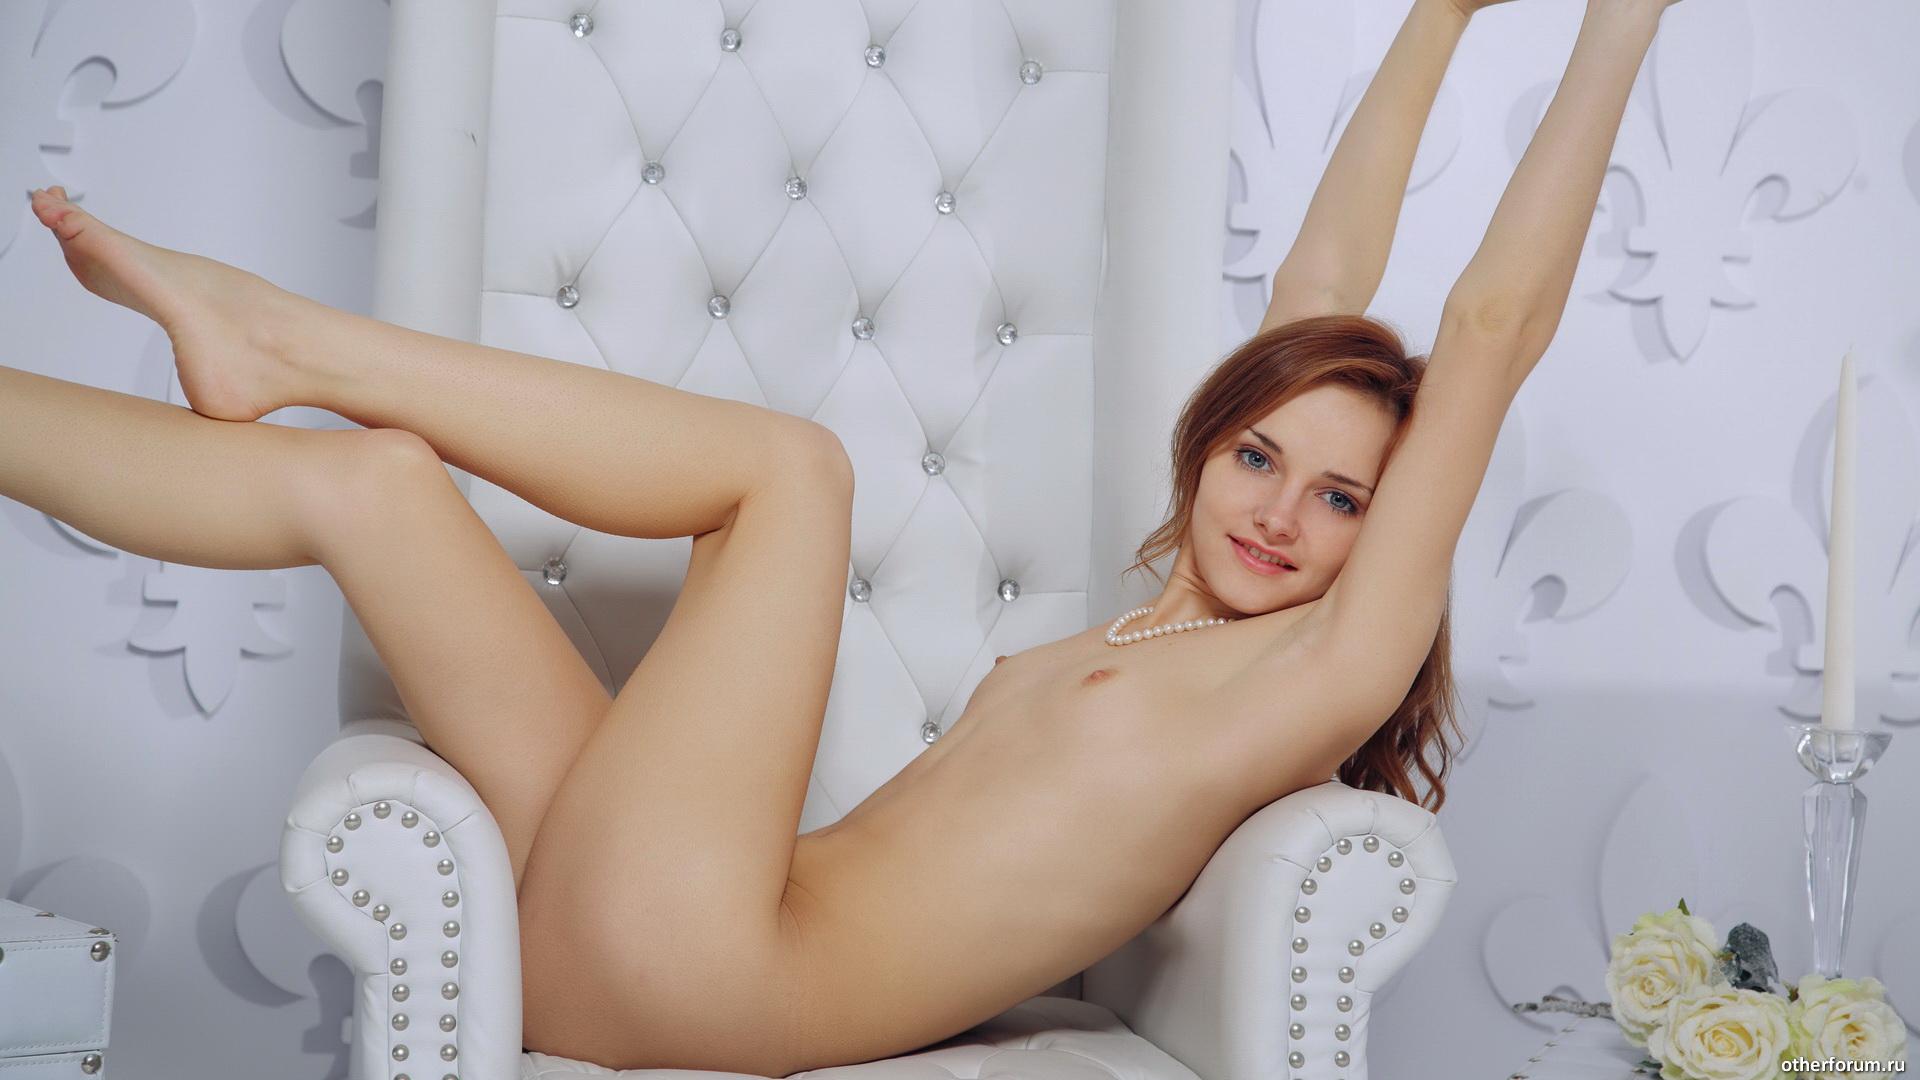 Cathleen A Sko Ya Lika Модель Частная Колекция